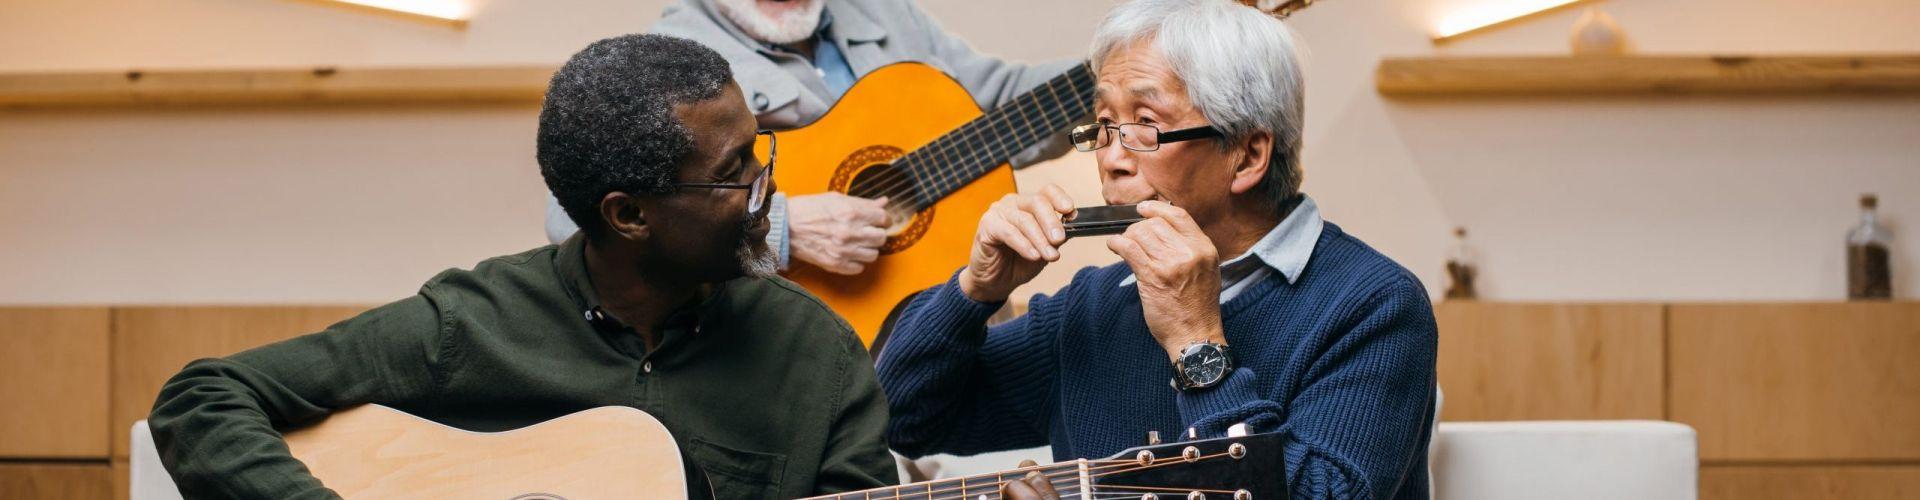 Three men making music together.